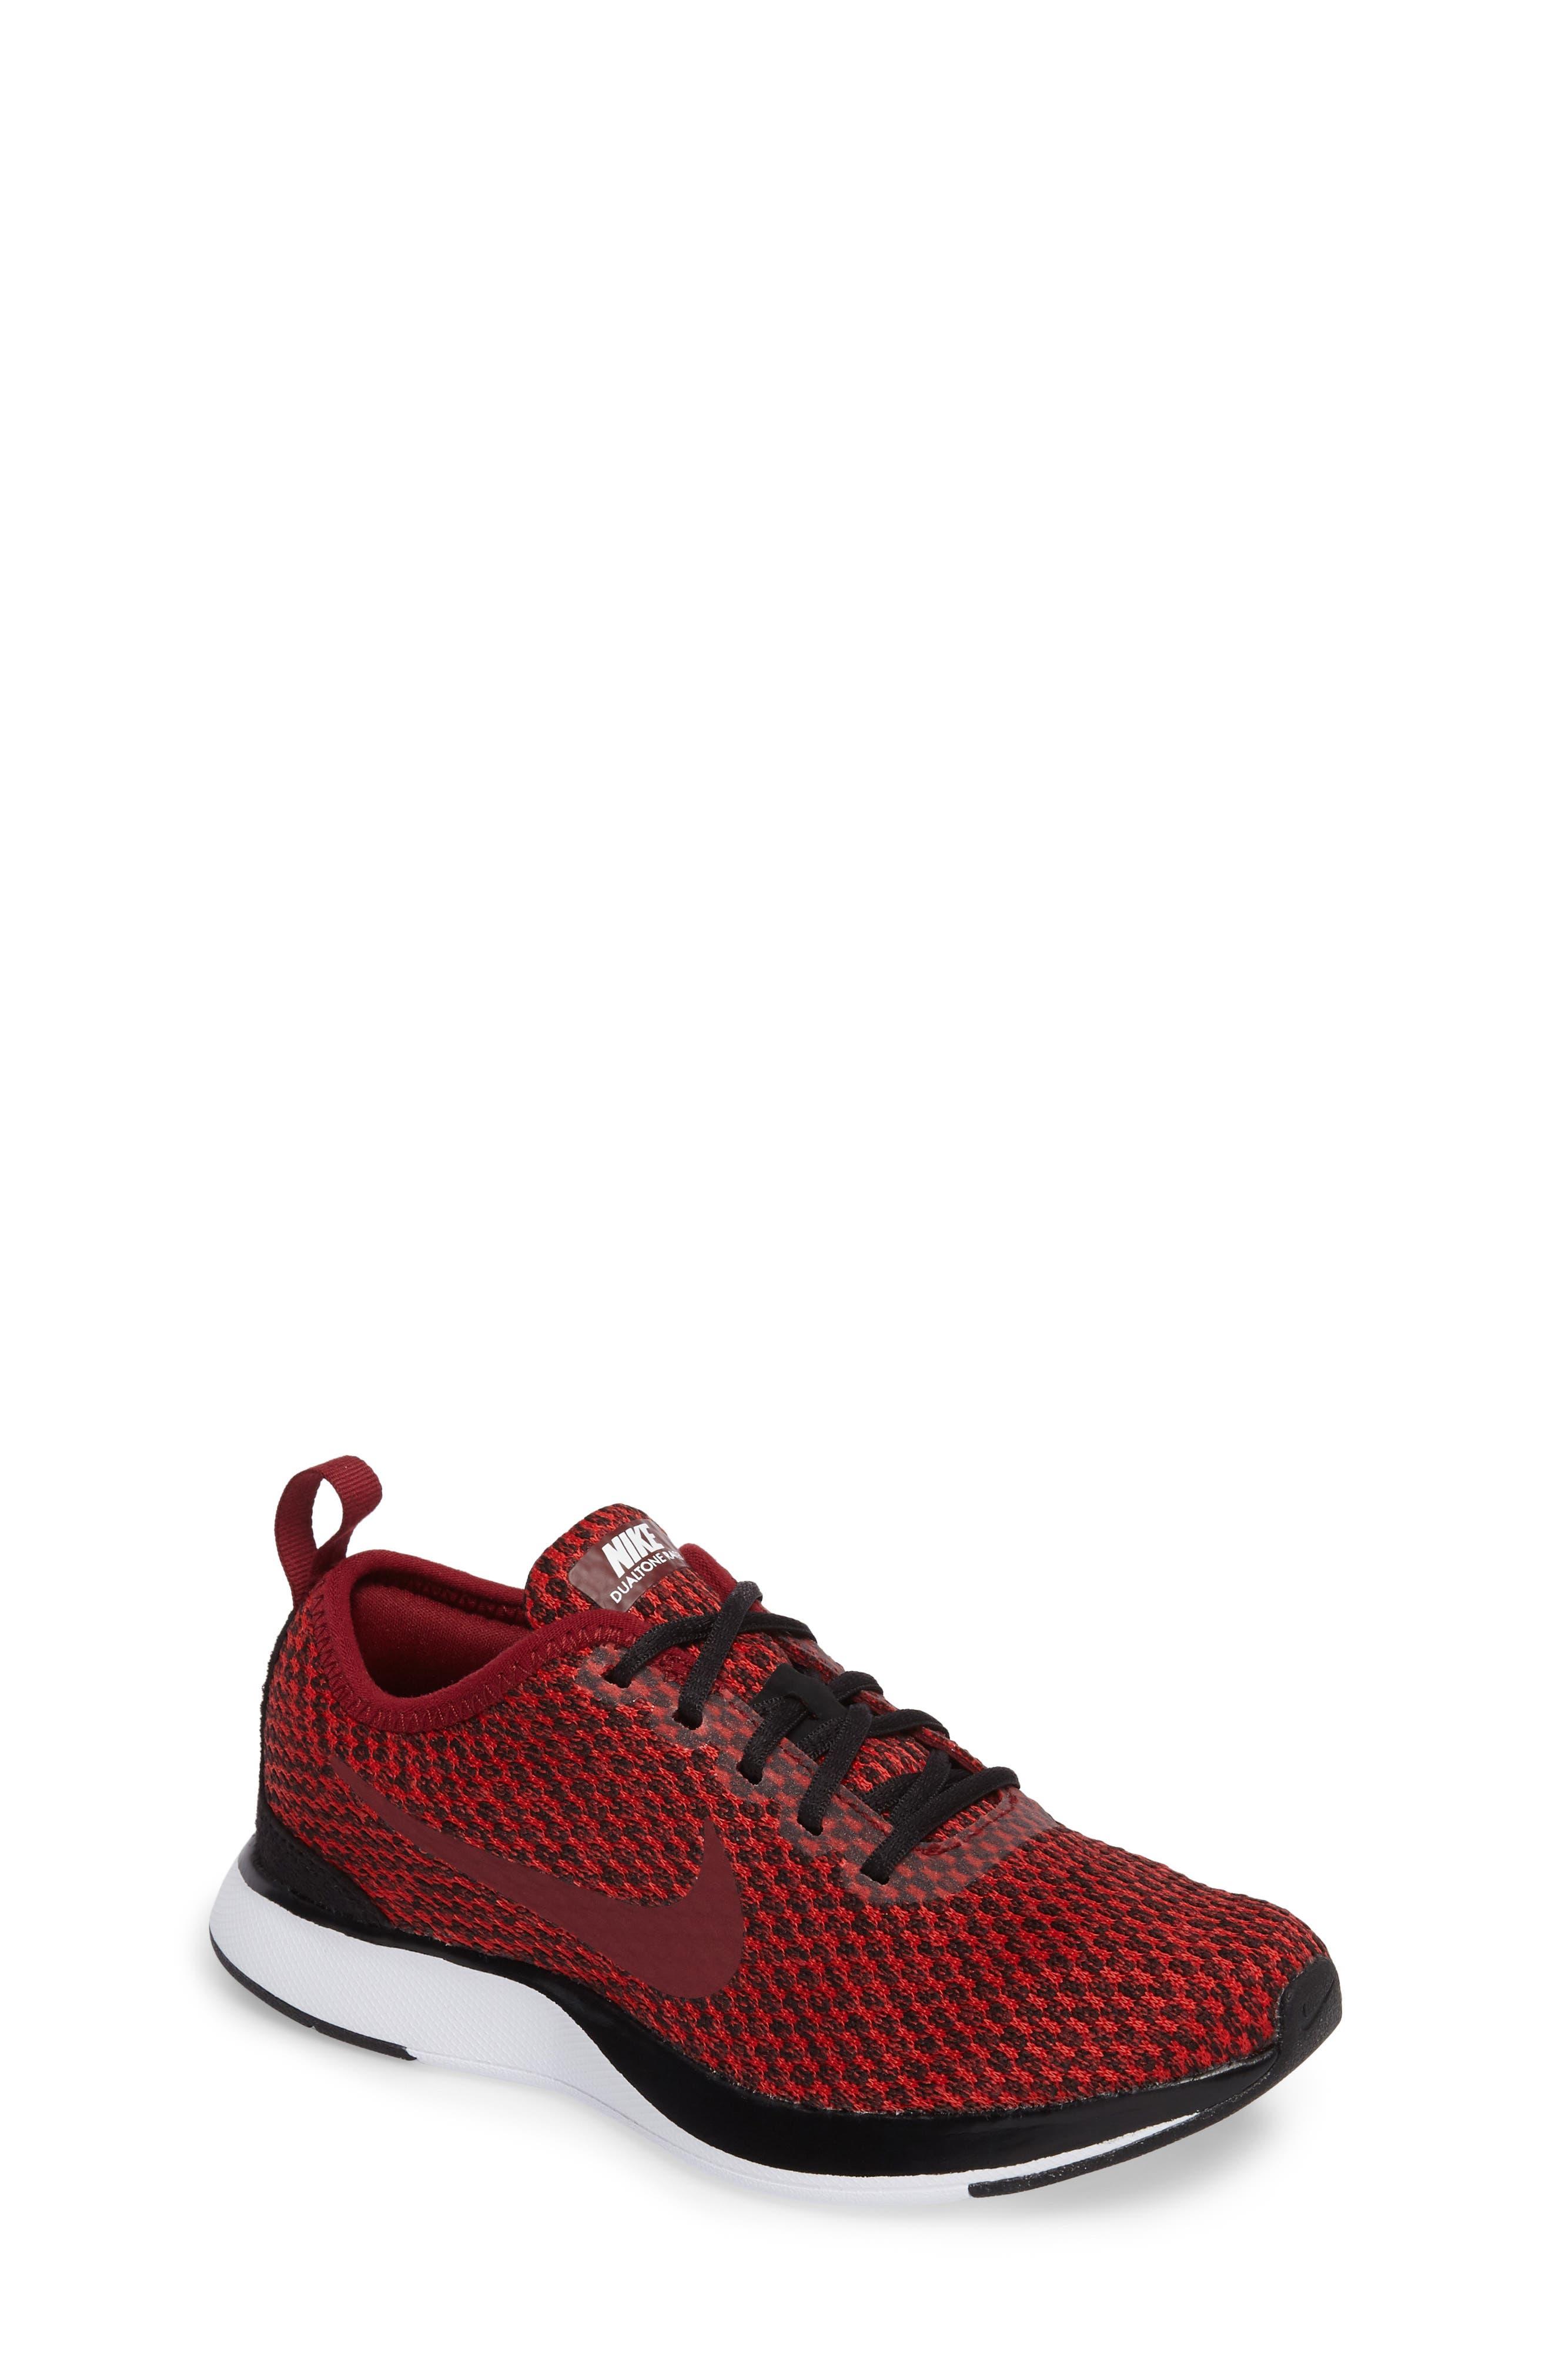 NIKE Dualtone Racer SE Sneaker